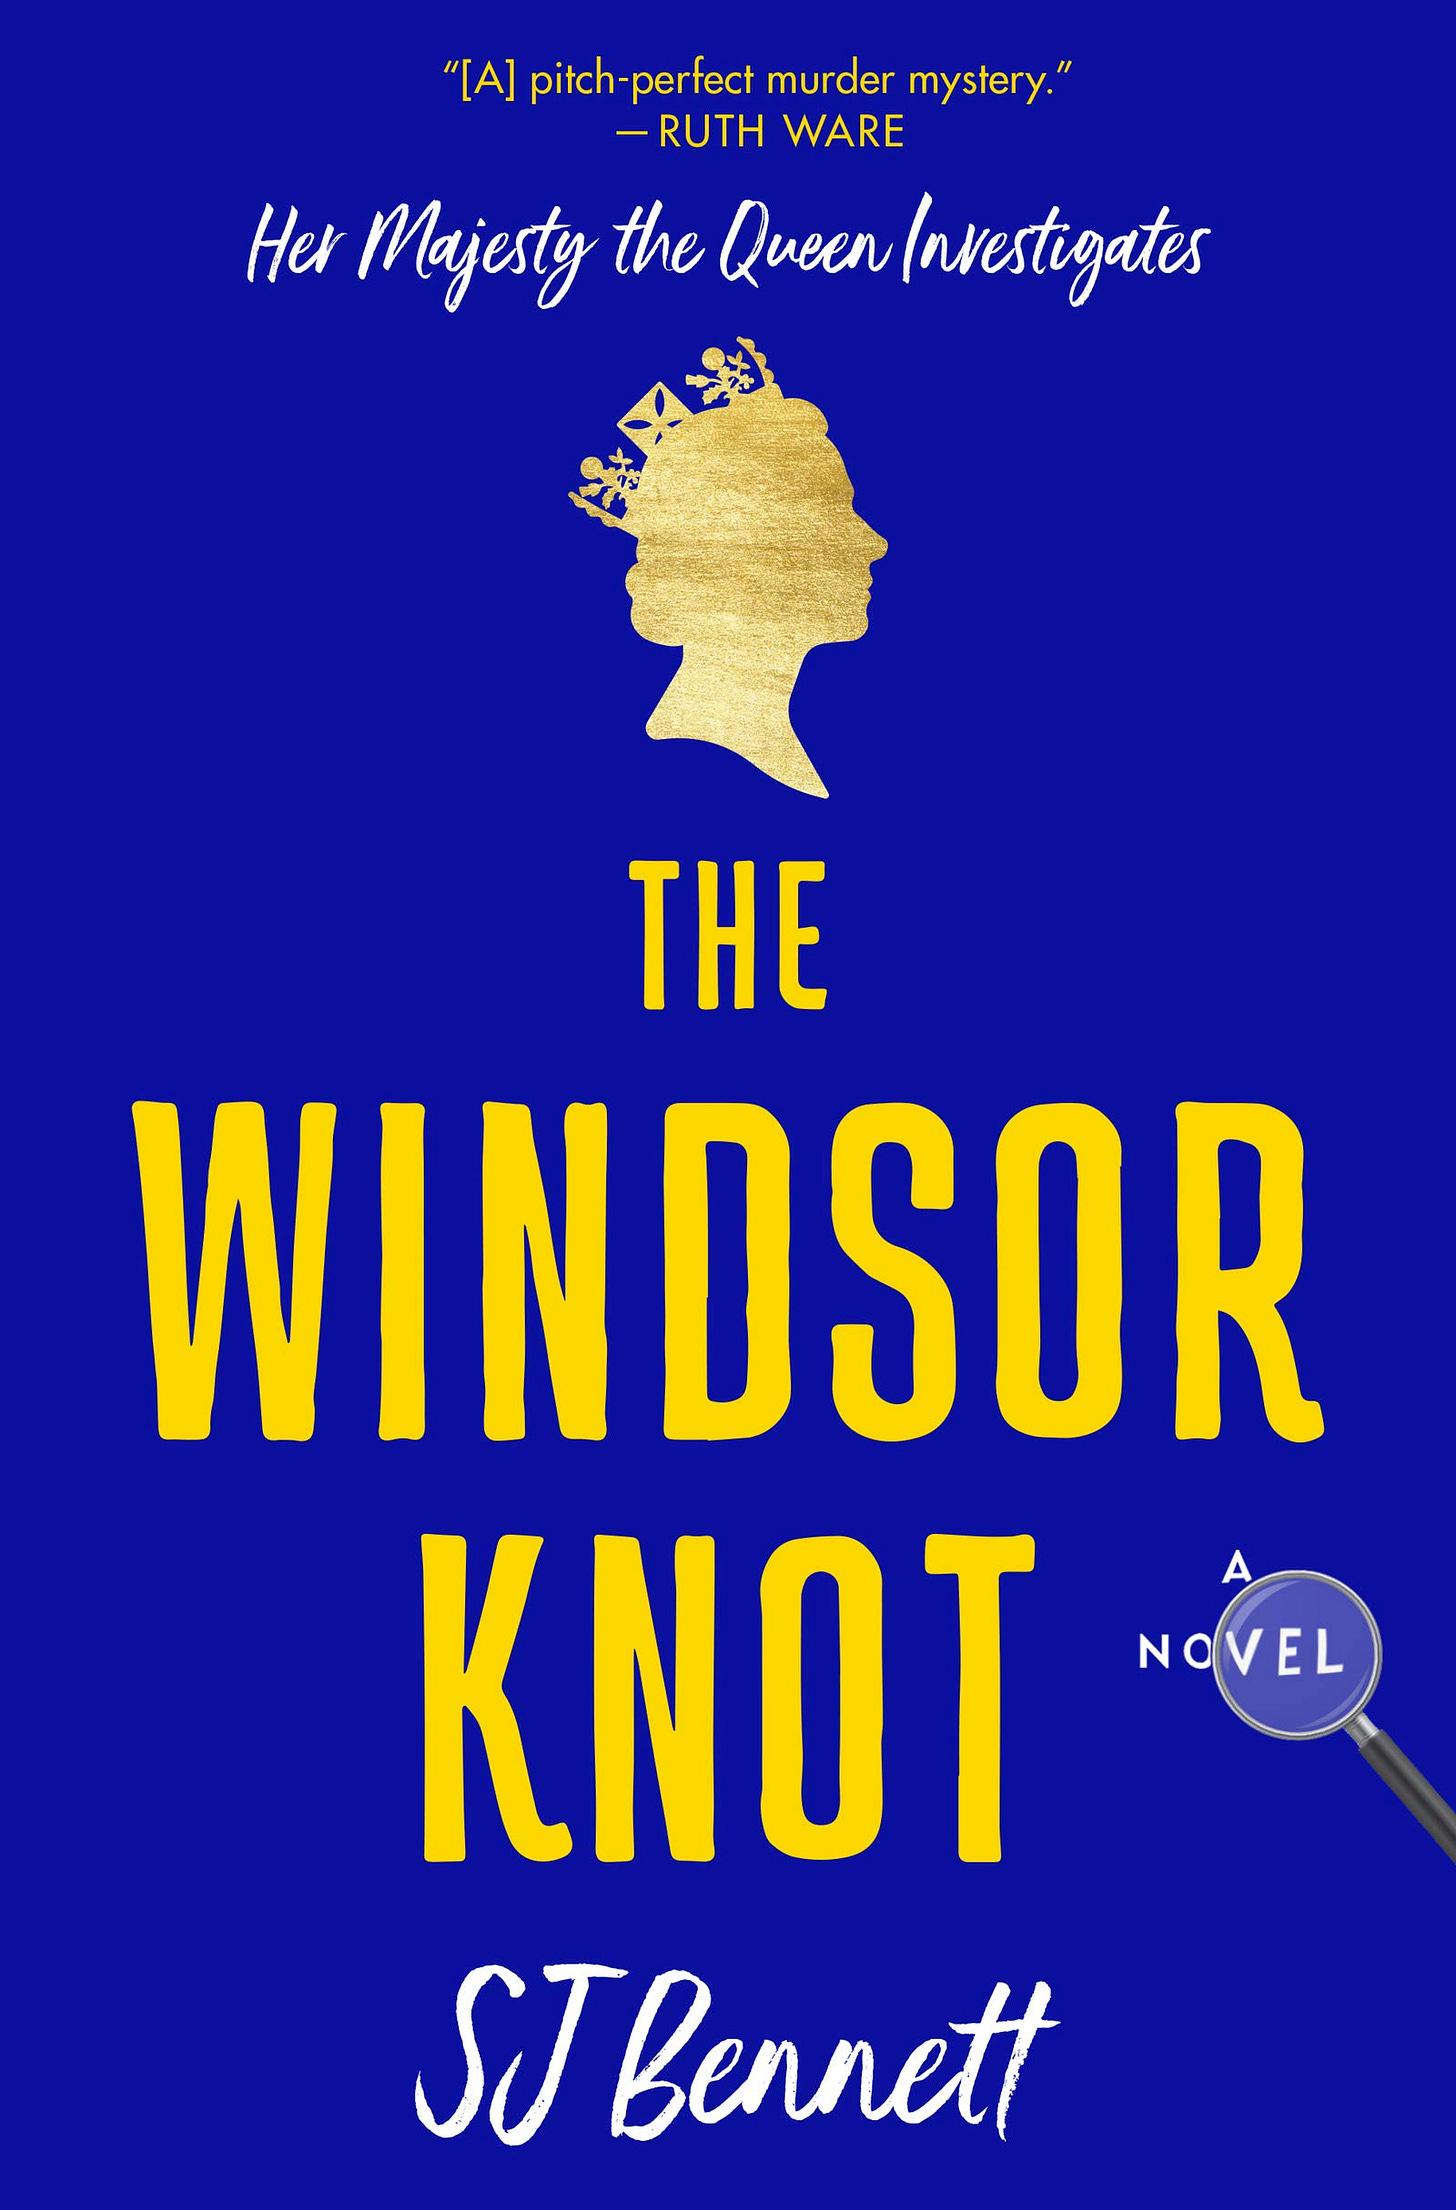 Amazon.com: The Windsor Knot: A Novel (Her Majesty the Queen Investigates,  1): 9780063050006: Bennett, SJ: Books